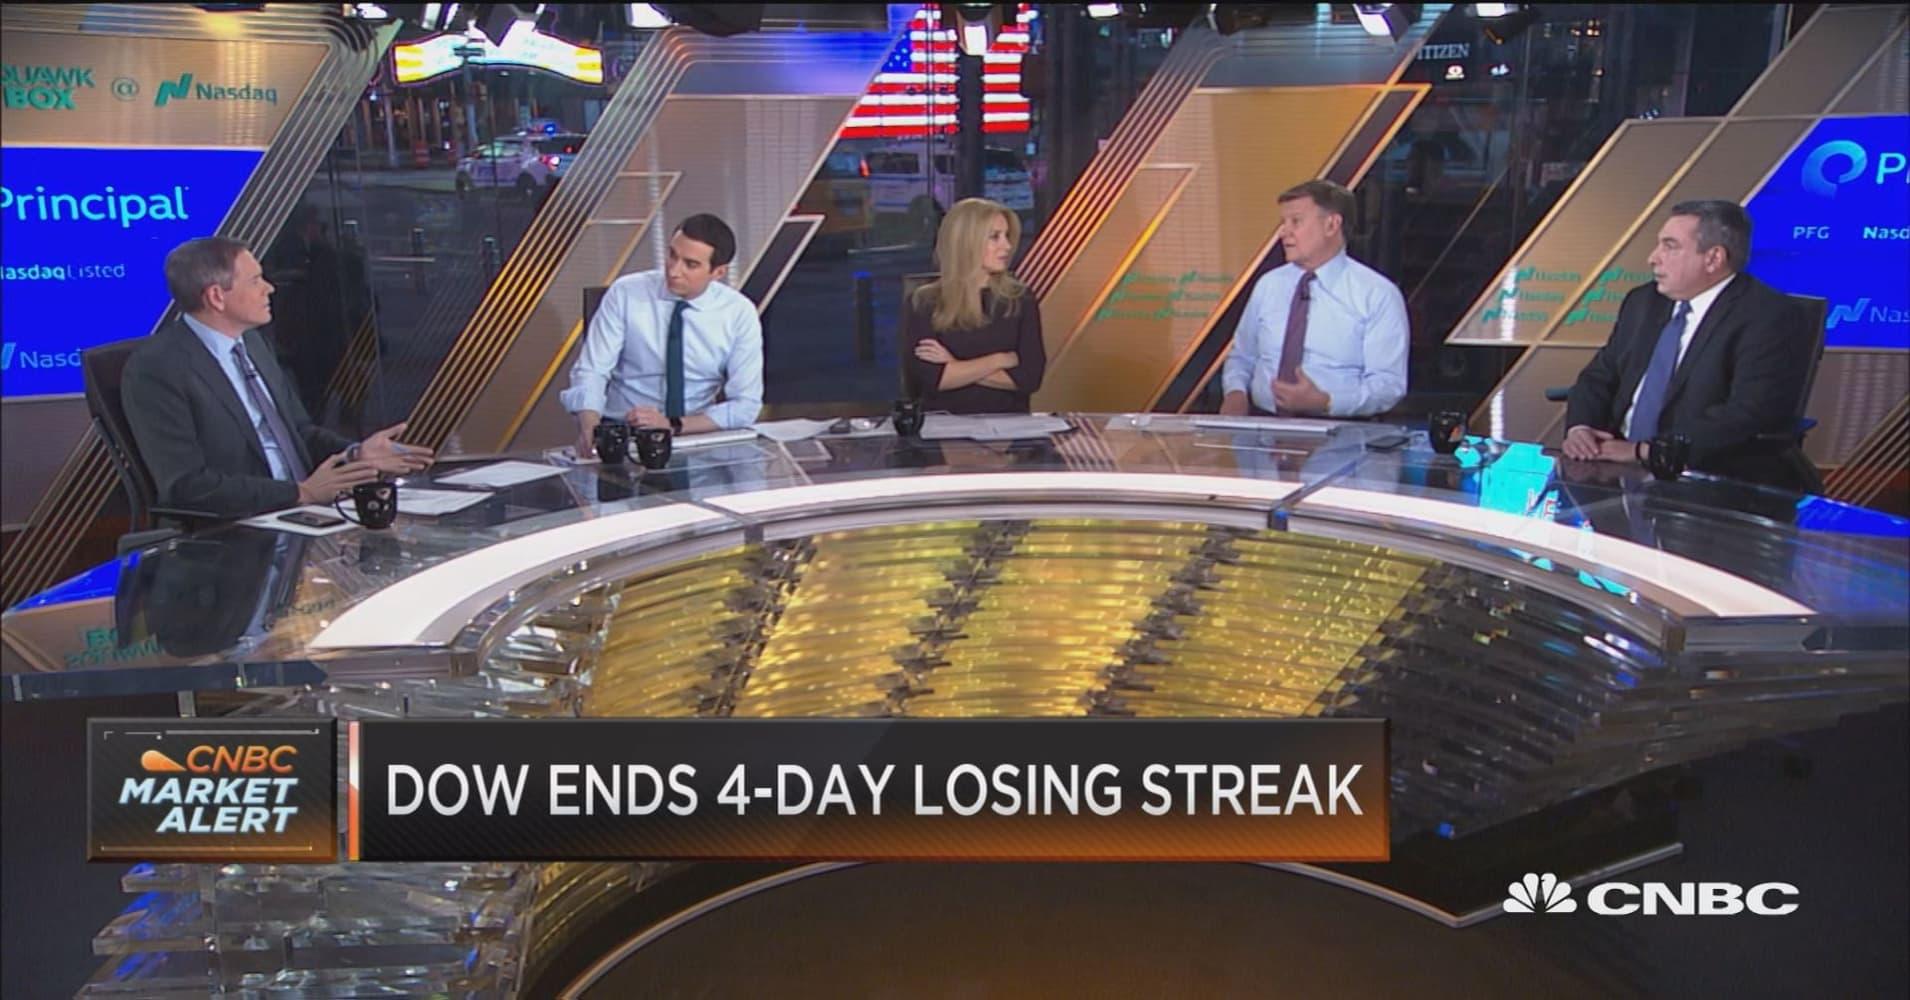 Tariffs are the big worry, says Pantheon Macroeconomics' Shepherdson